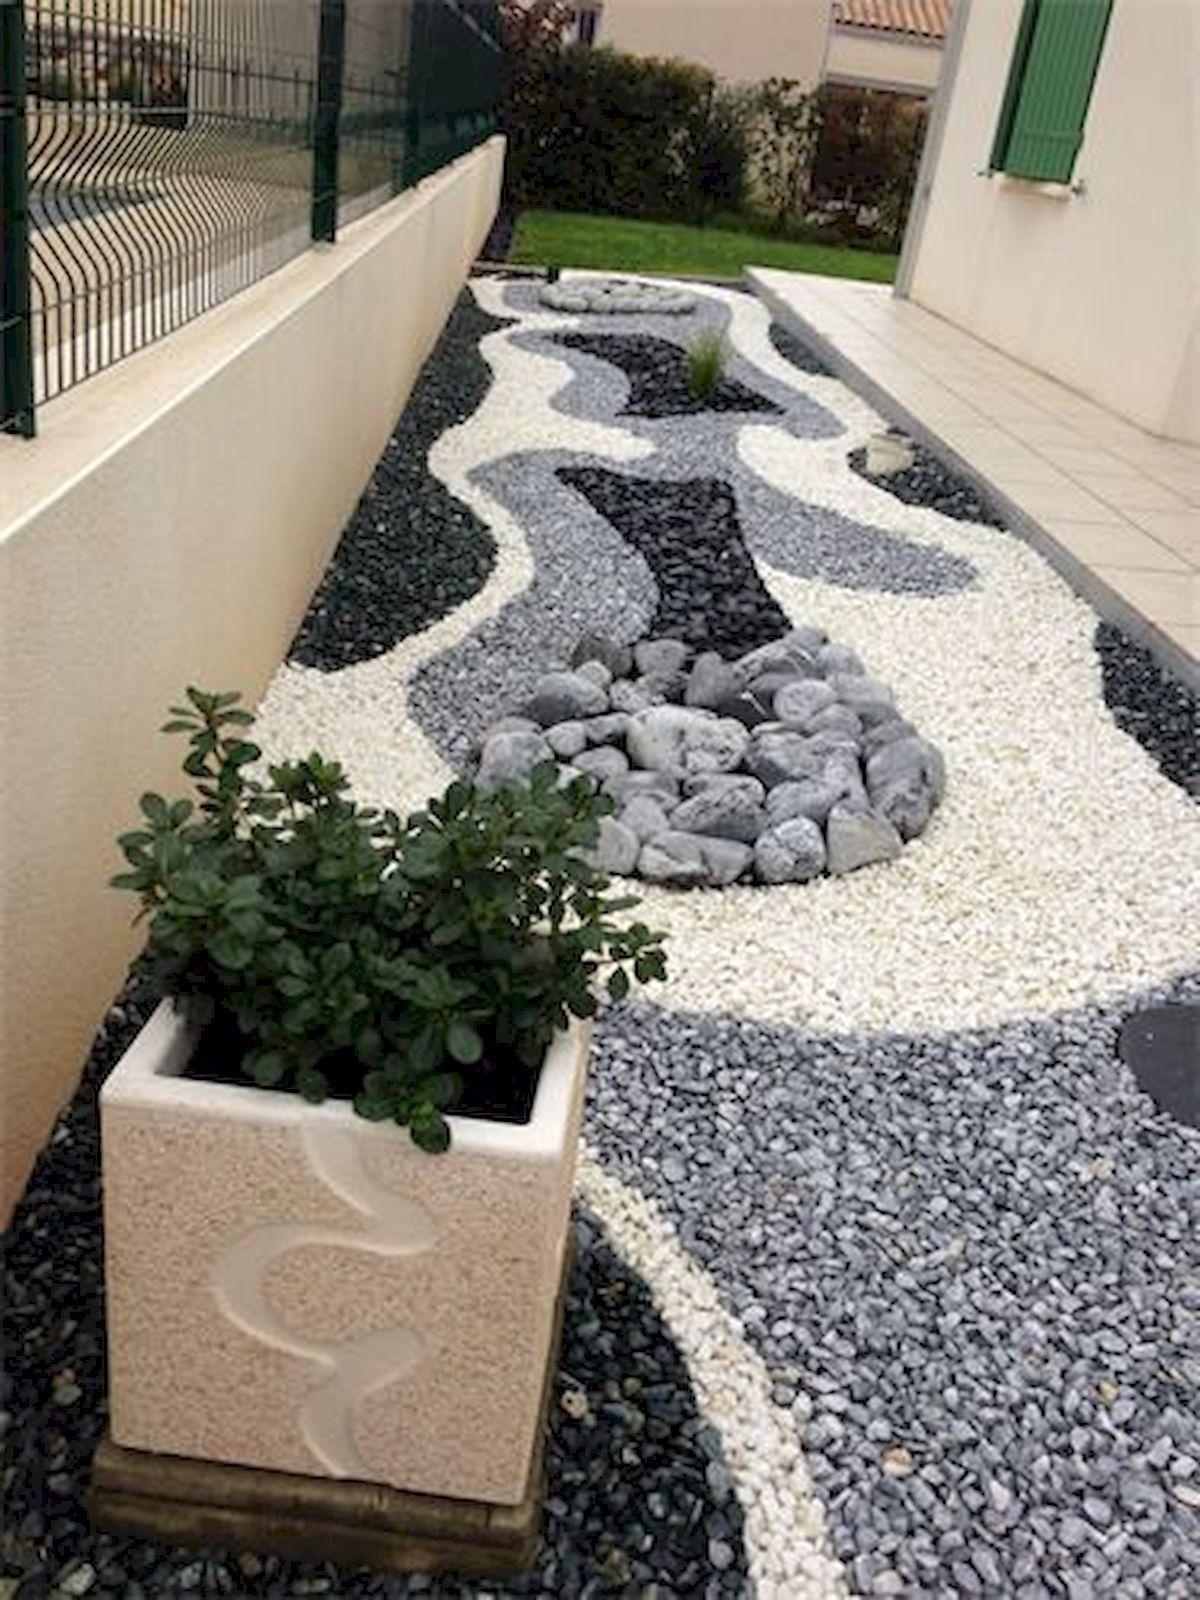 70 Magical Side Yard And Backyard Gravel Garden Design Ideas 9 Small Backyard Landscaping Front Yard Landscaping Design Garden Design